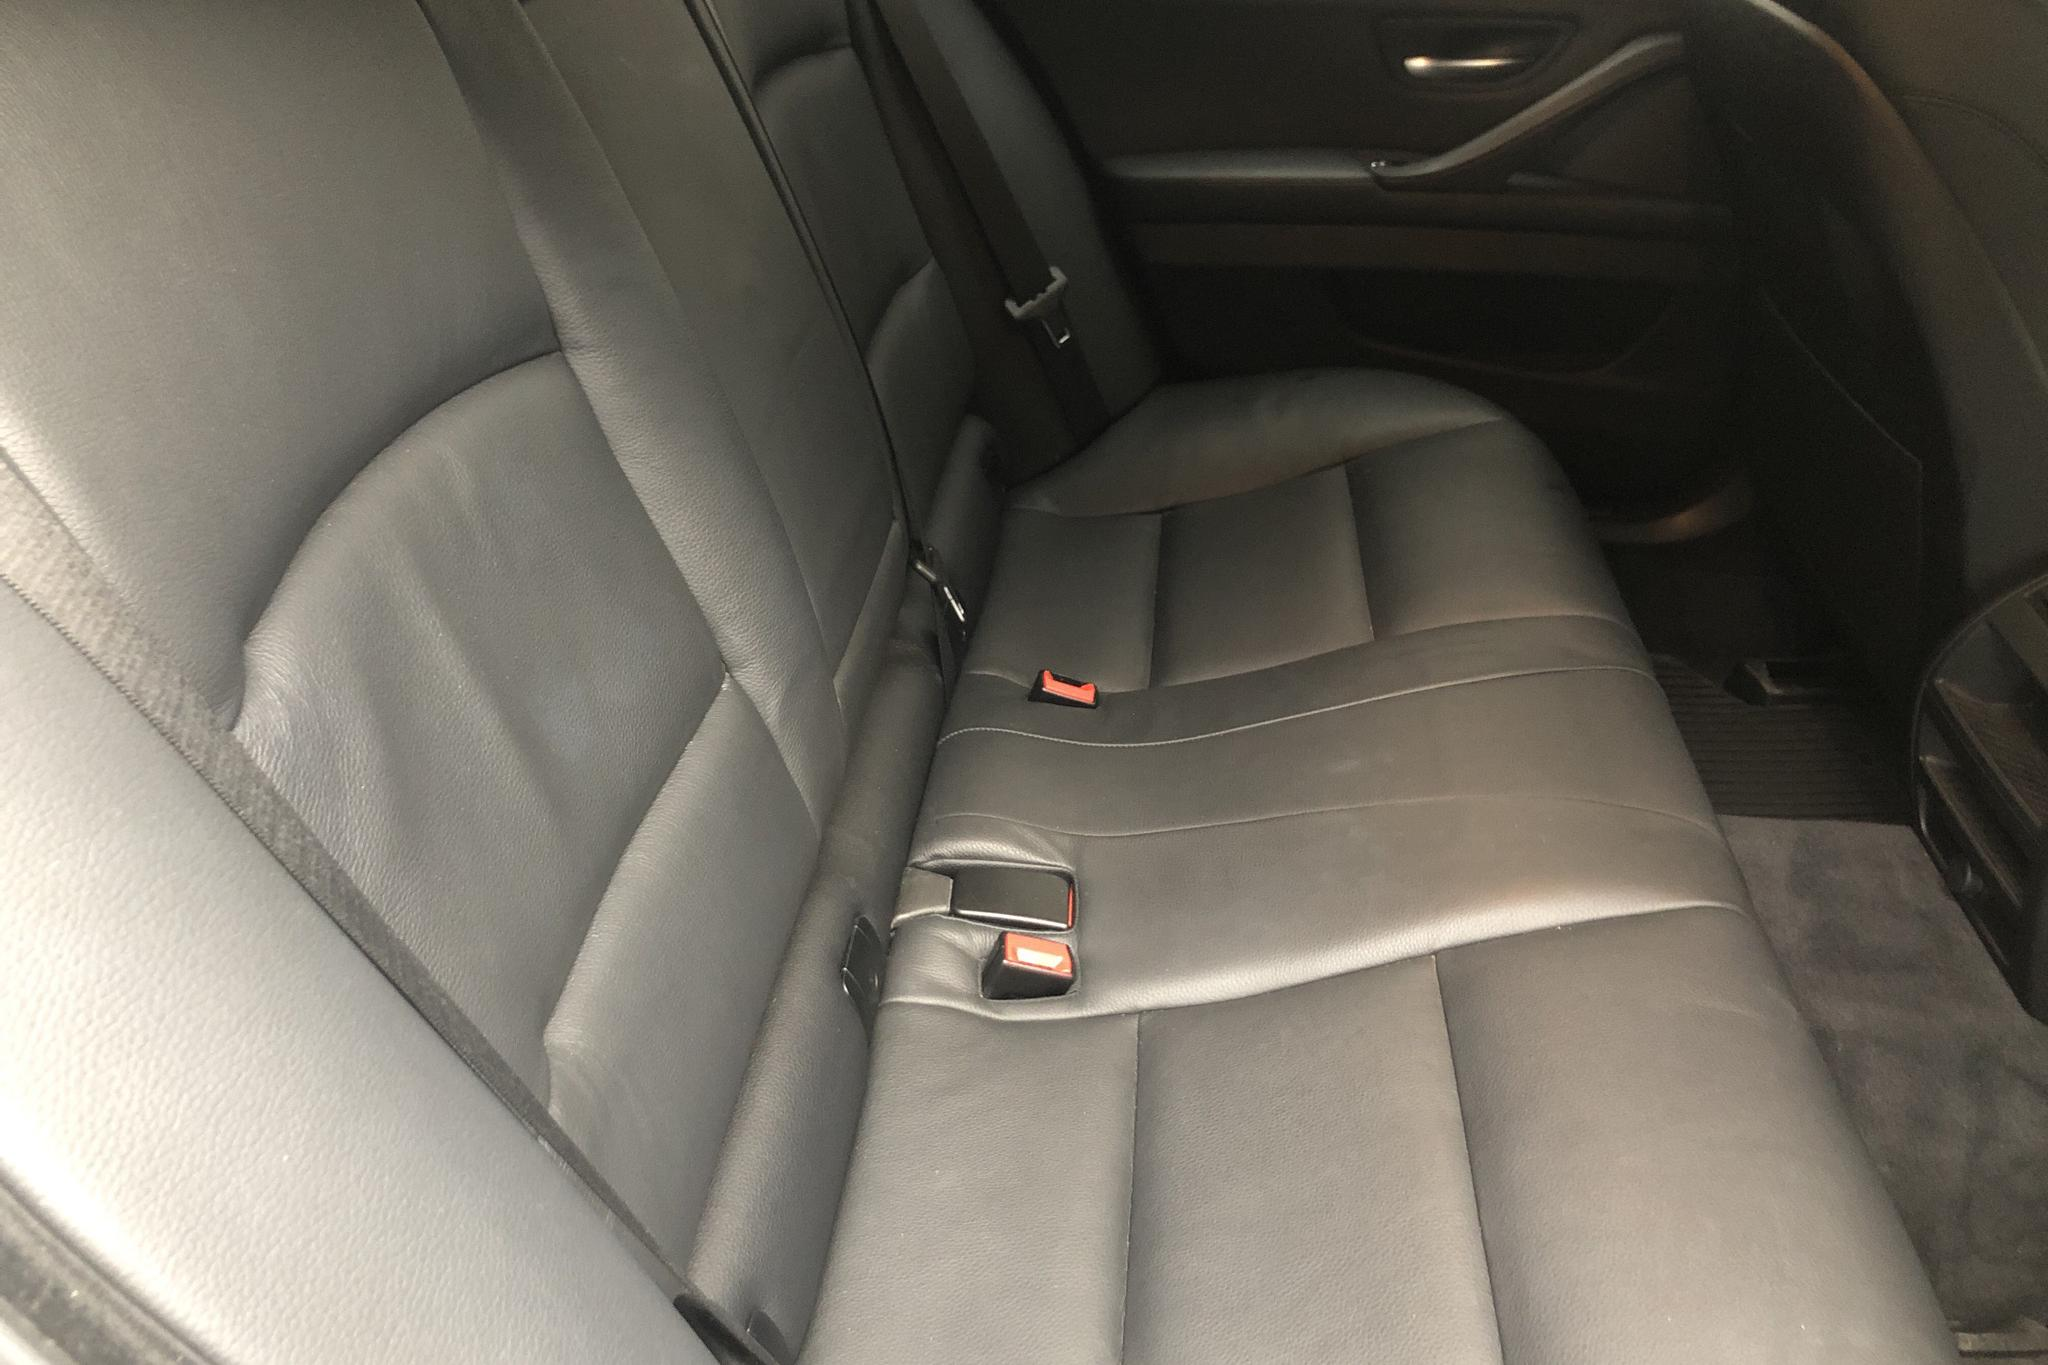 BMW 520d Touring, F11 (190hk) - 102 930 km - Automatic - white - 2017